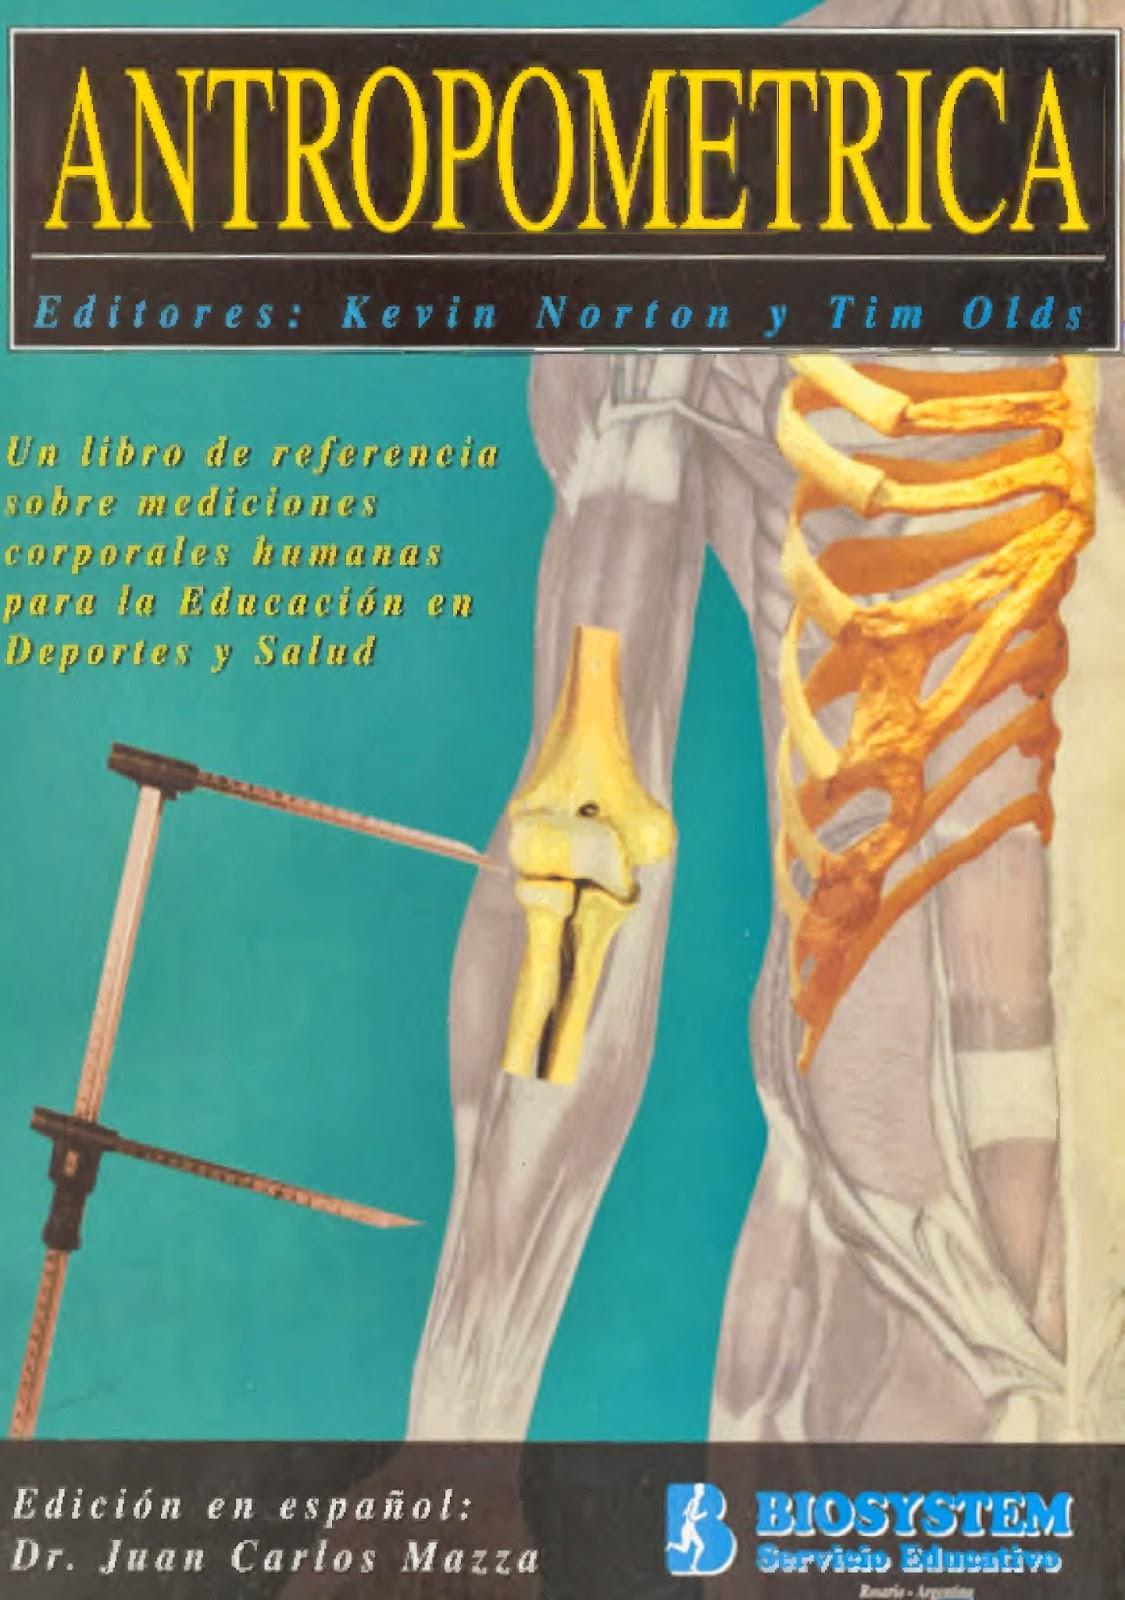 Aporte nutricional antropometrica norton k for Libro de antropometria